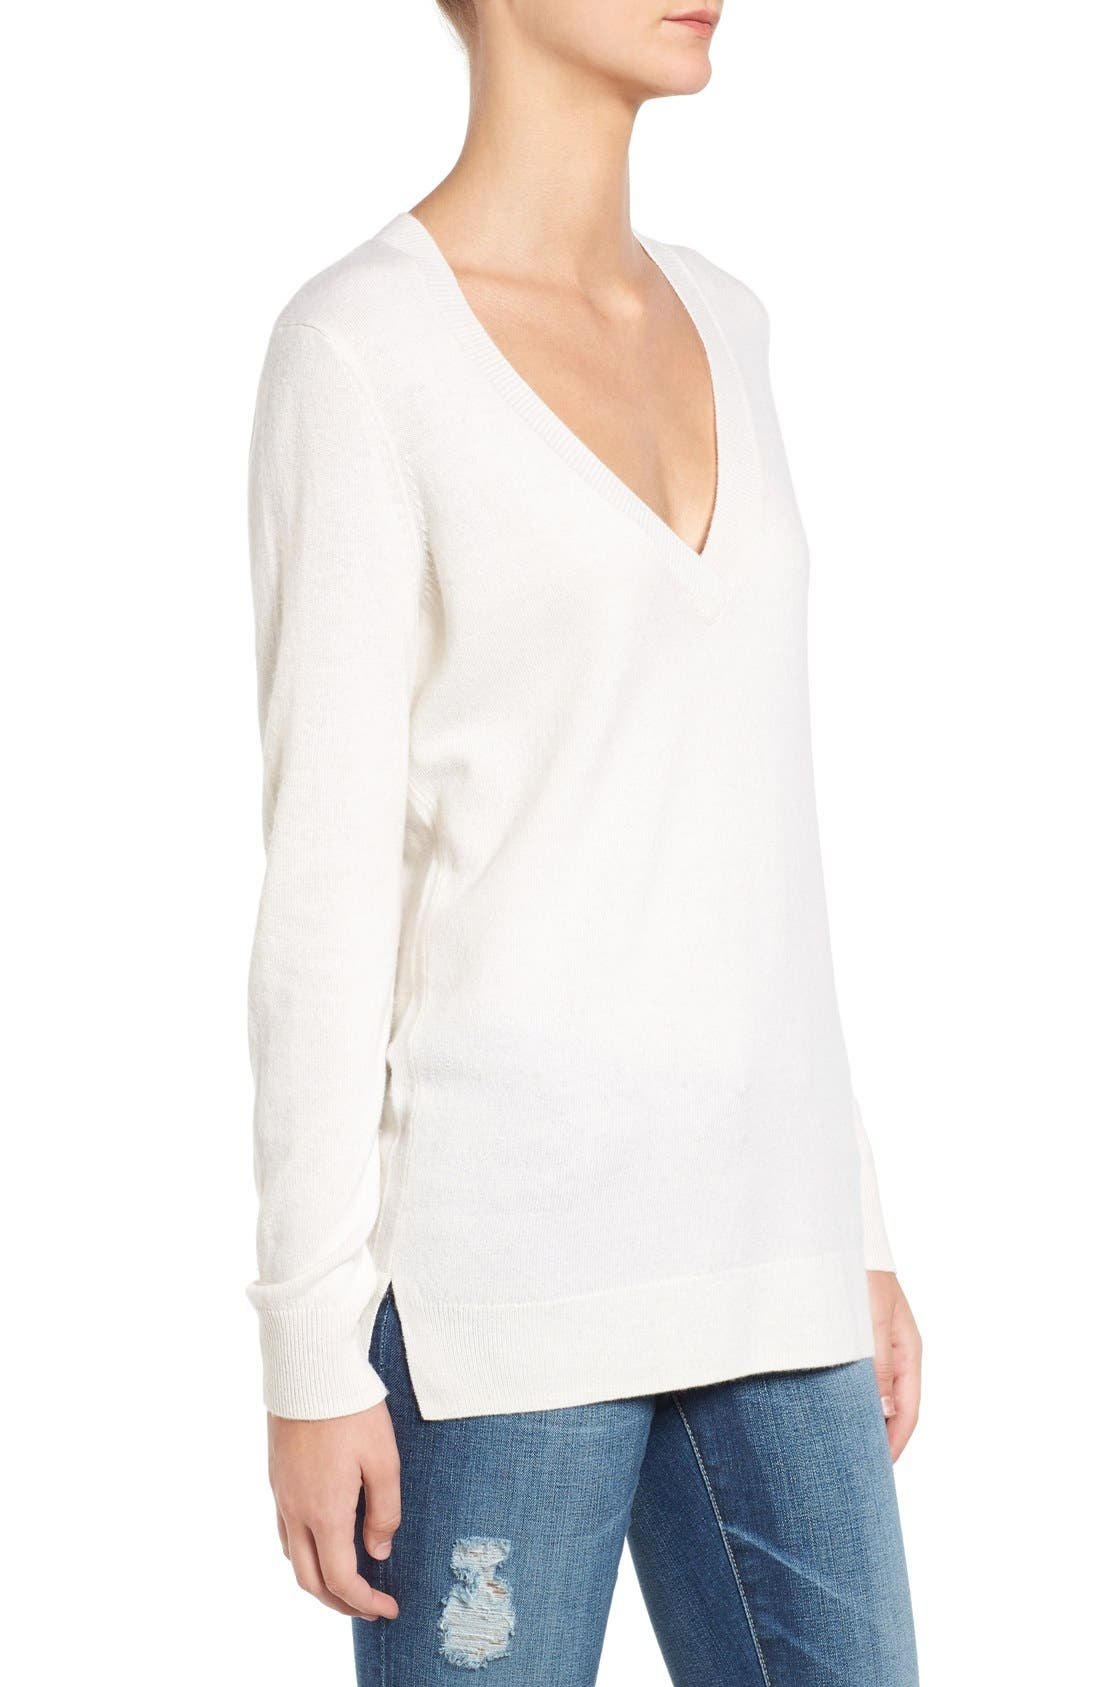 Luna V-Neck Merino & Cashmere Tunic Sweater,                             Alternate thumbnail 3, color,                             Powdered White